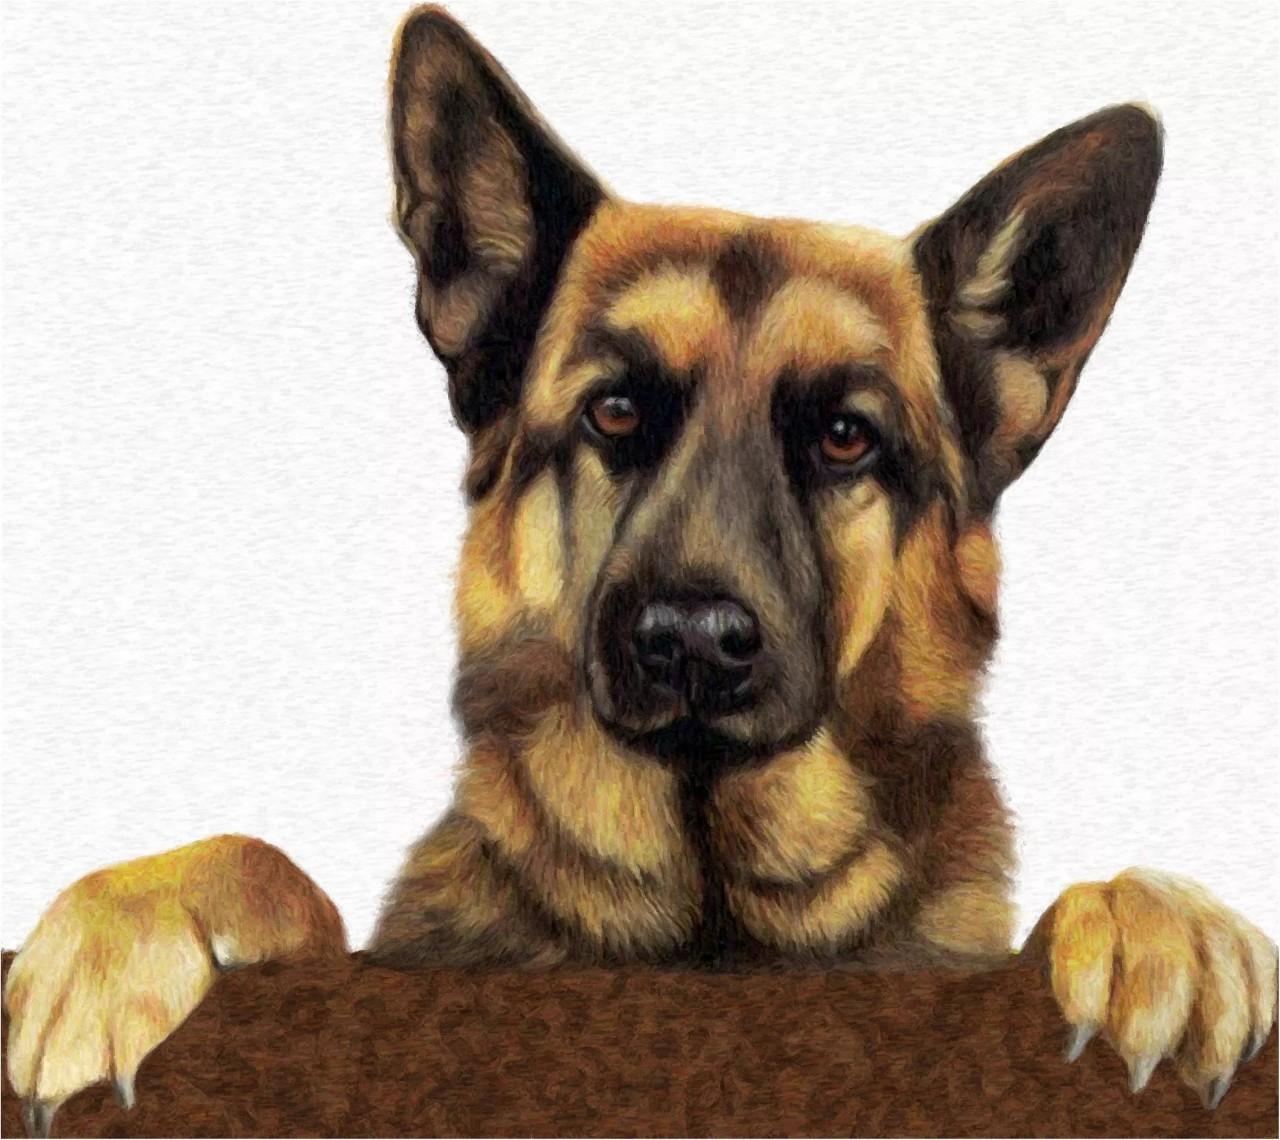 Картинки собаки овчарки спасибо за внимание, день водителя